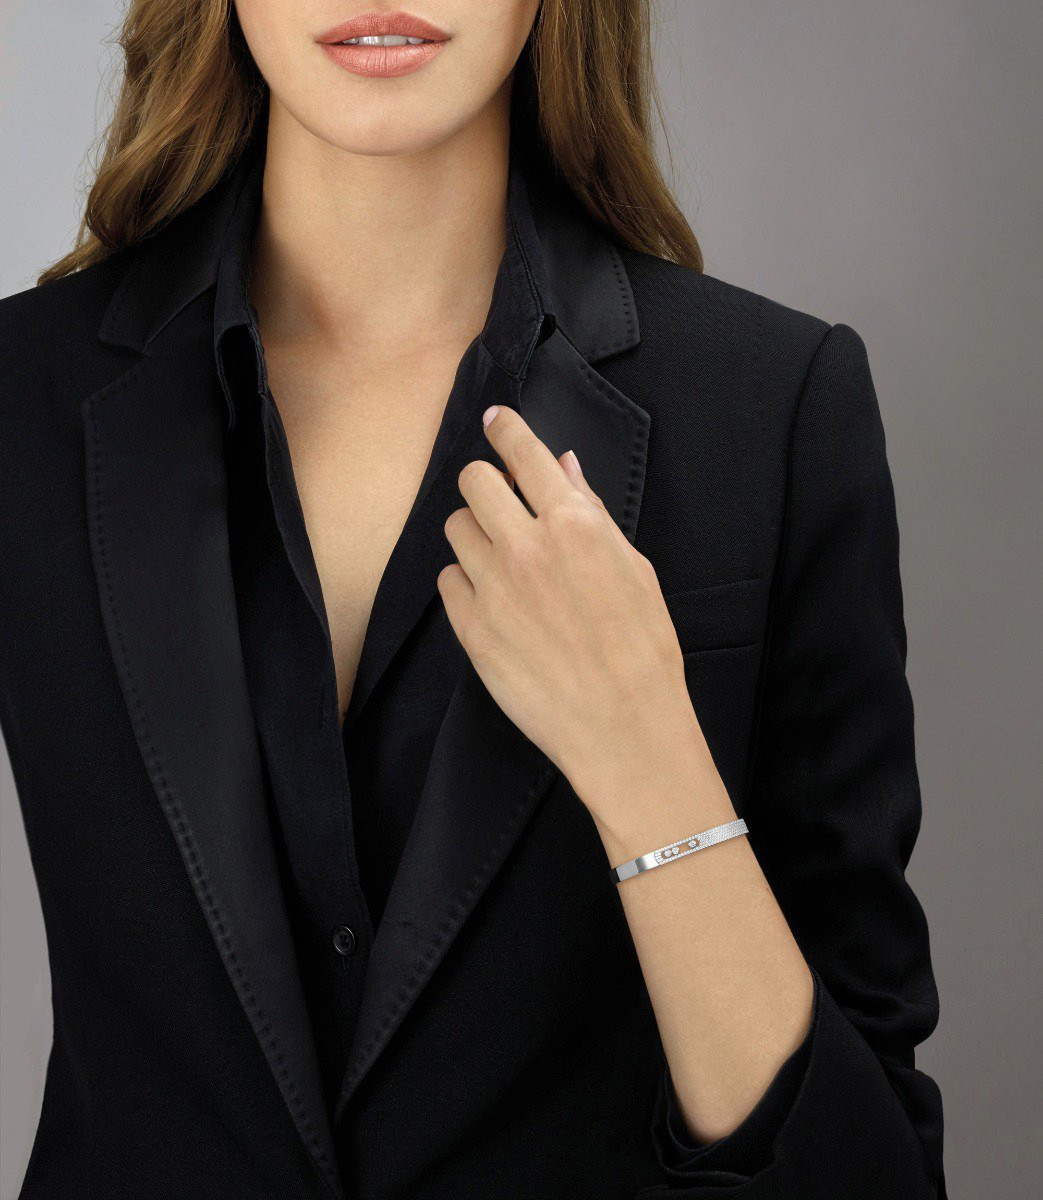 Messika Move Noa Pavé Diamond Bangle Bracelet in 18K Gold on model